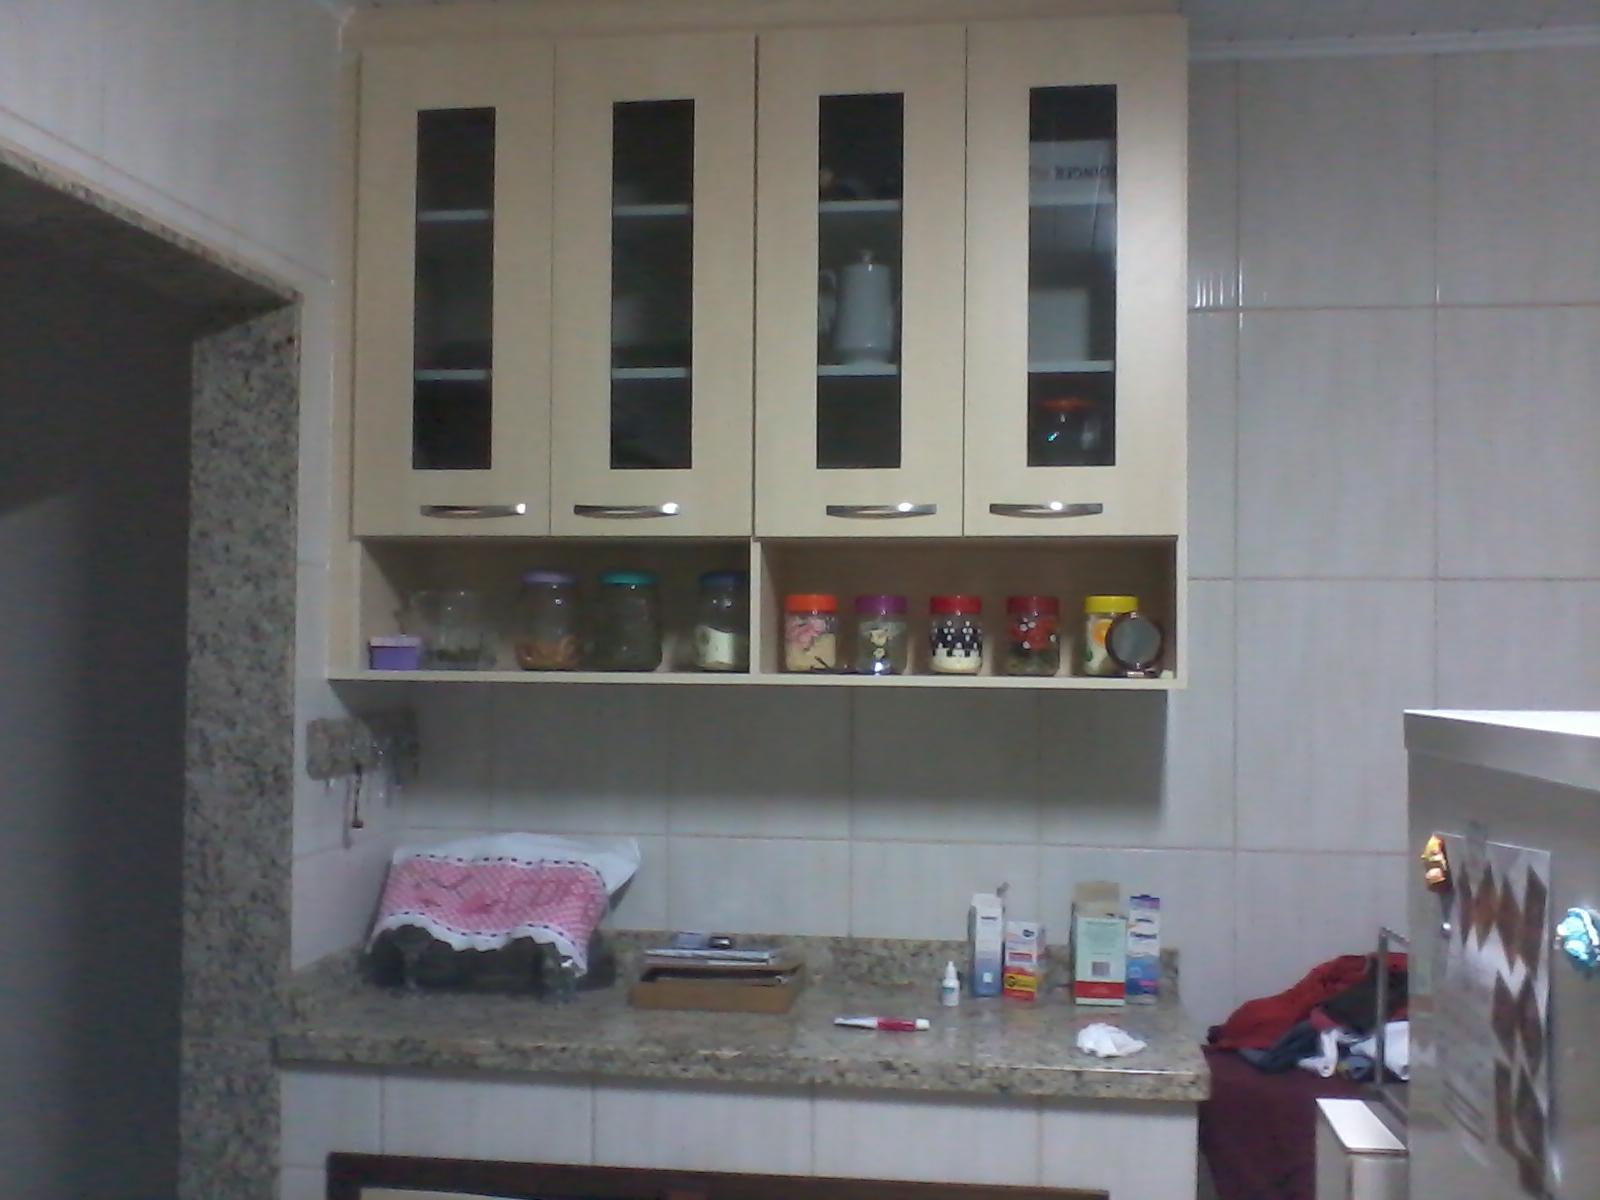 Móveis Sob Medida Jair F. Stocco: Cozinhas #5F4342 1600 1200